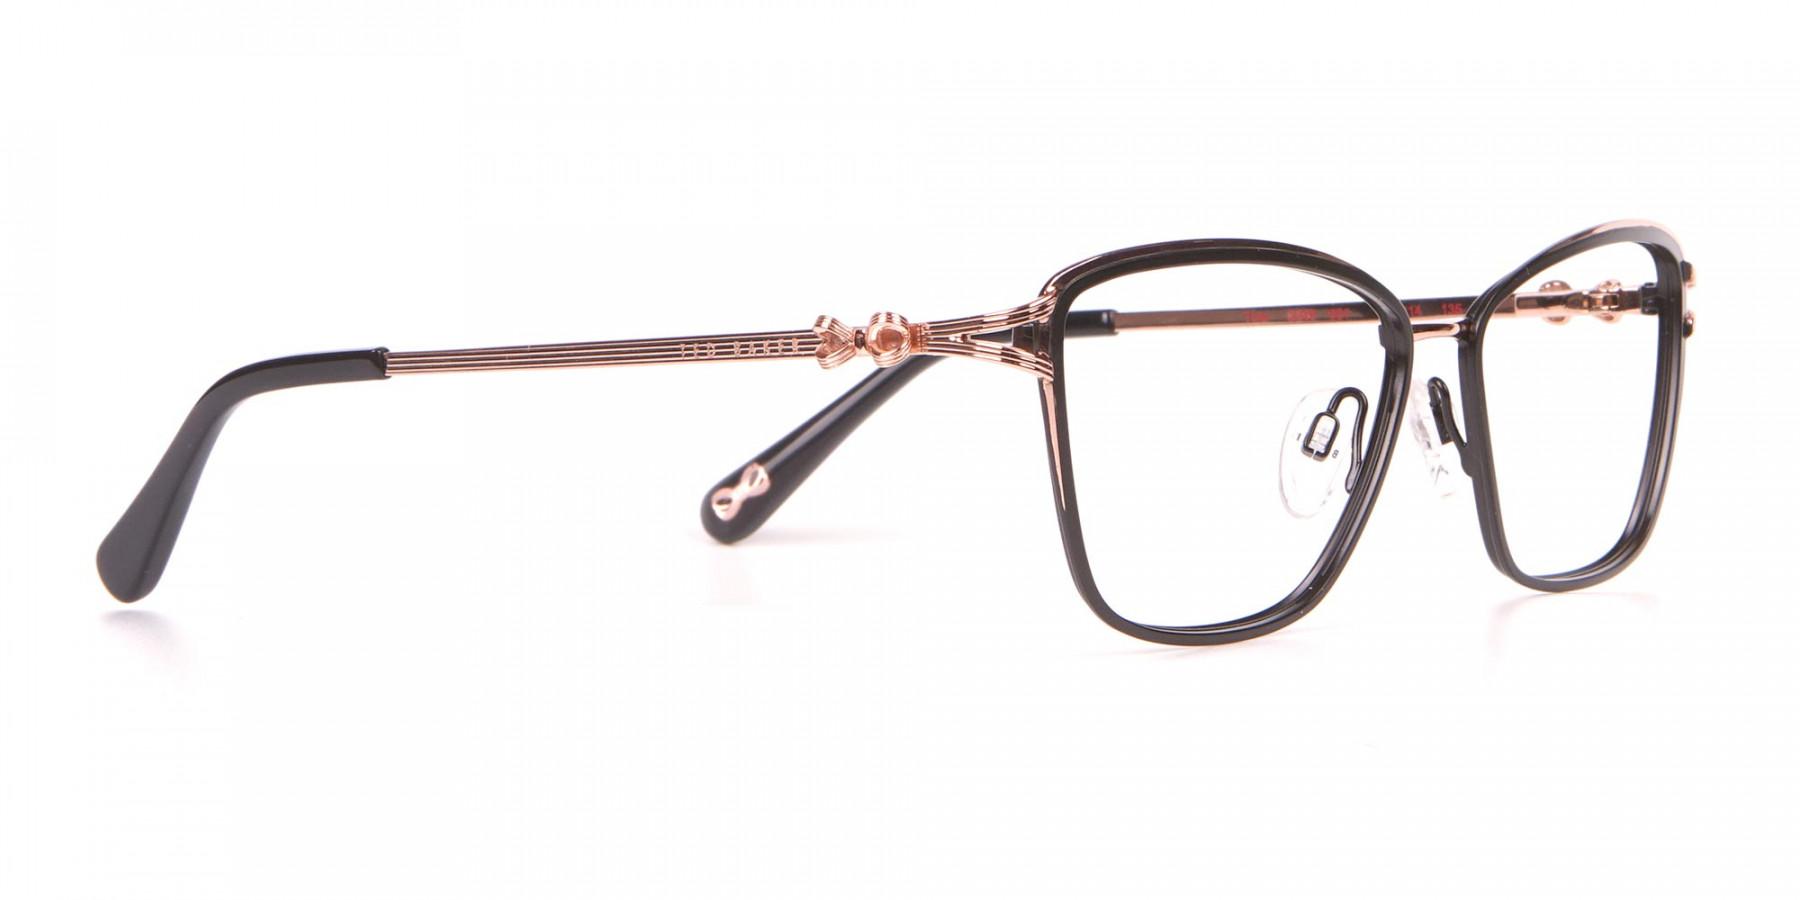 Ted Baker TB2245 Tula Women's Classic Cat Eye Glasses Black-1